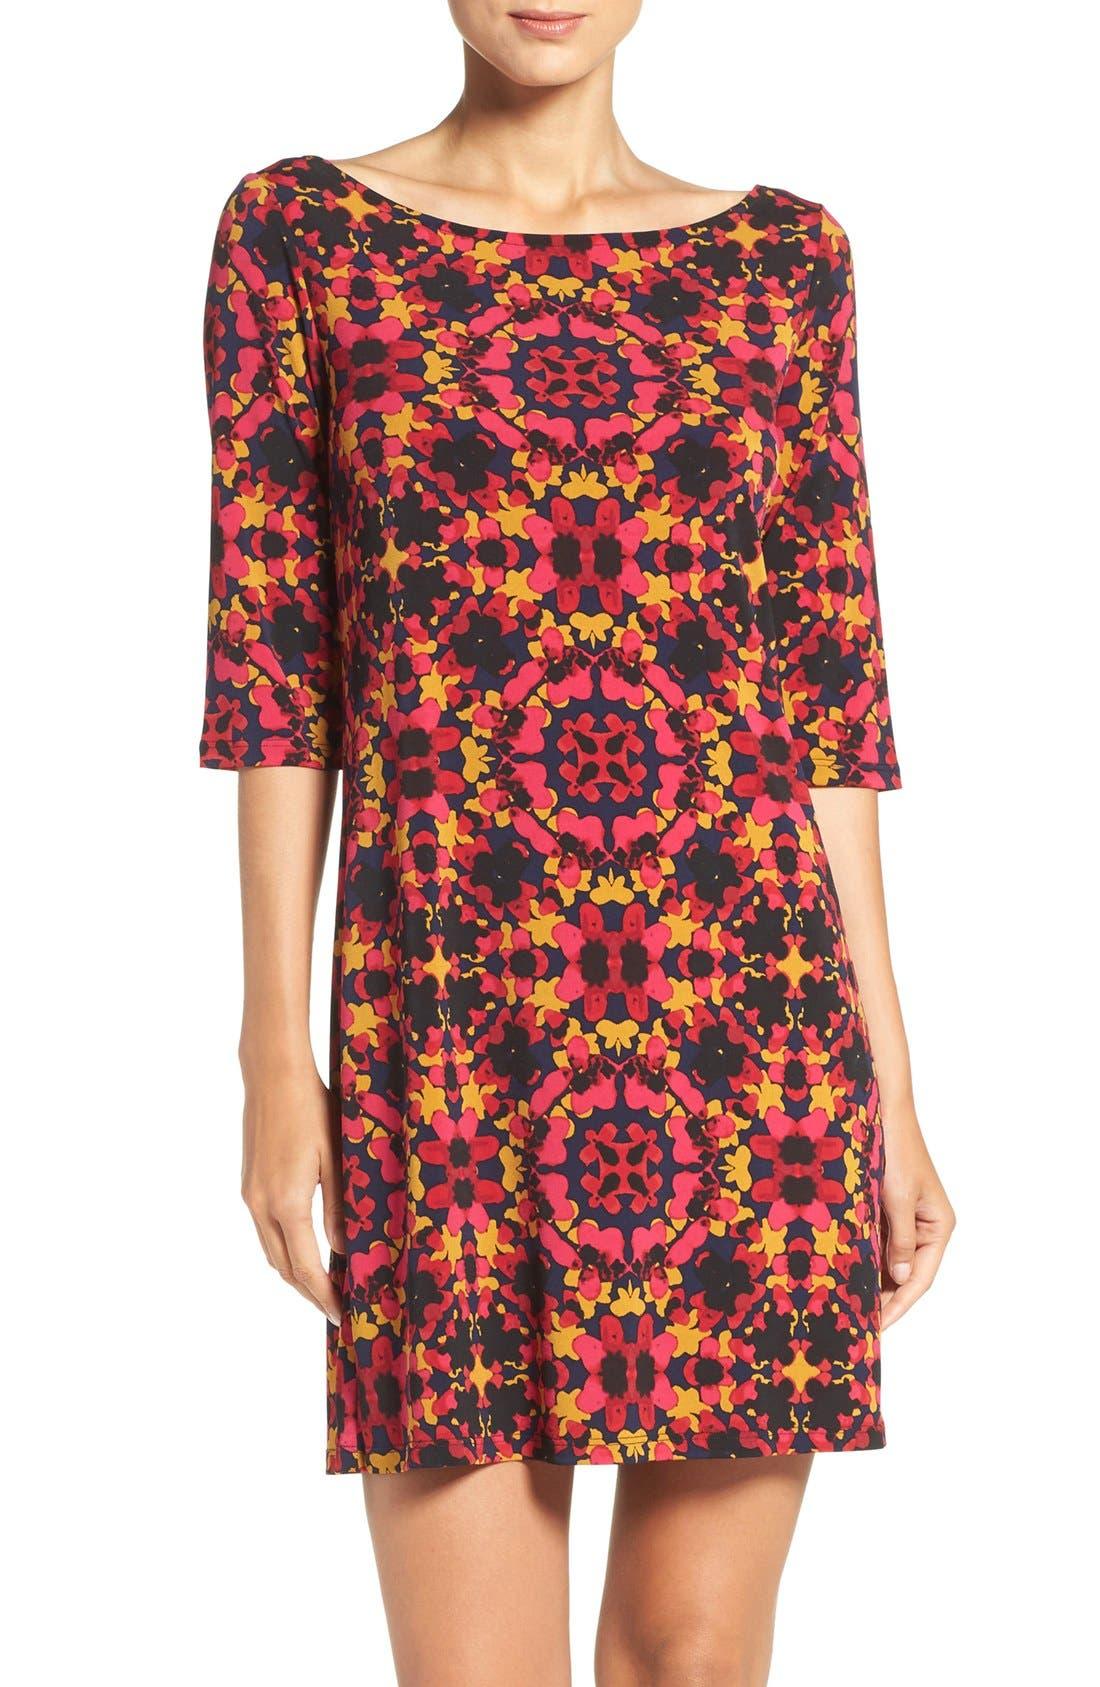 Alternate Image 1 Selected - Leota Dolman Sleeve Jersey Sheath Dress